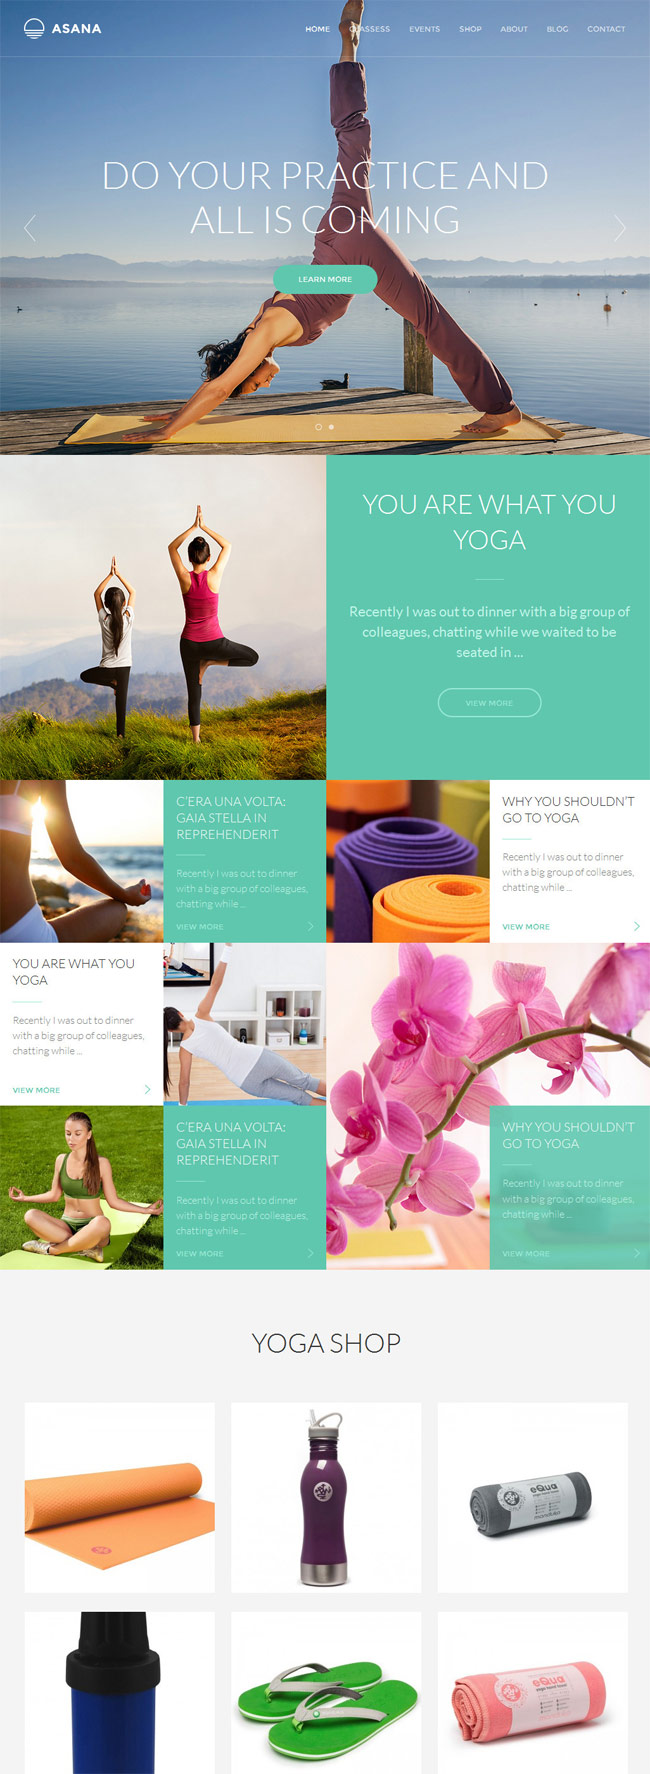 Asana-Sport-and-Yoga-WordPress-Theme